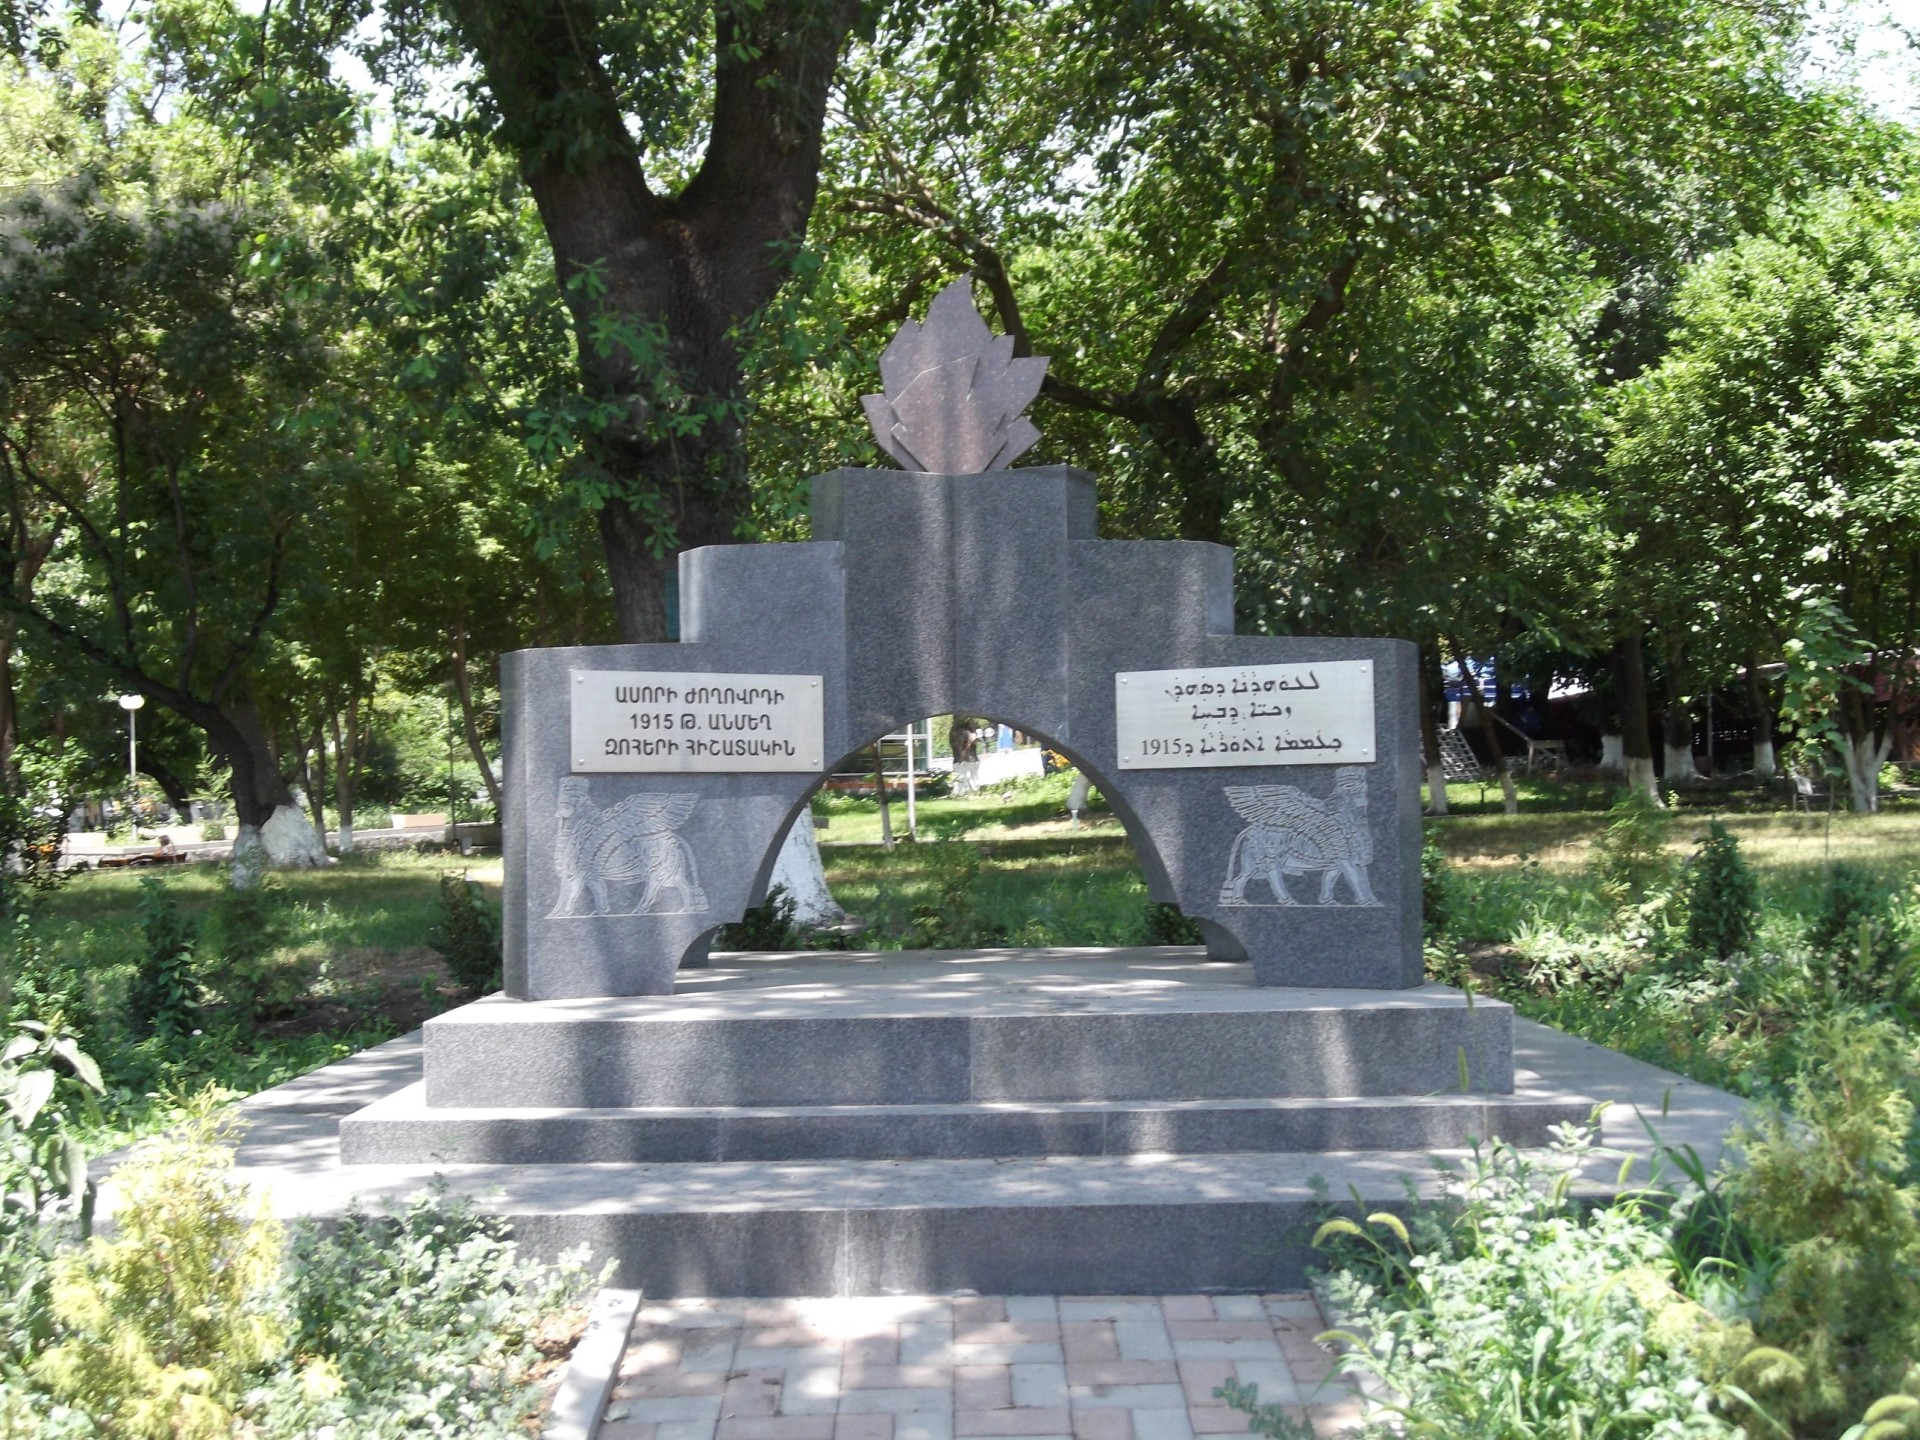 https://i1.wp.com/armenianweekly.com/wp-content/uploads/2013/03/Assyrian-Genocide-Monument-Yerevan-Armenia.jpg